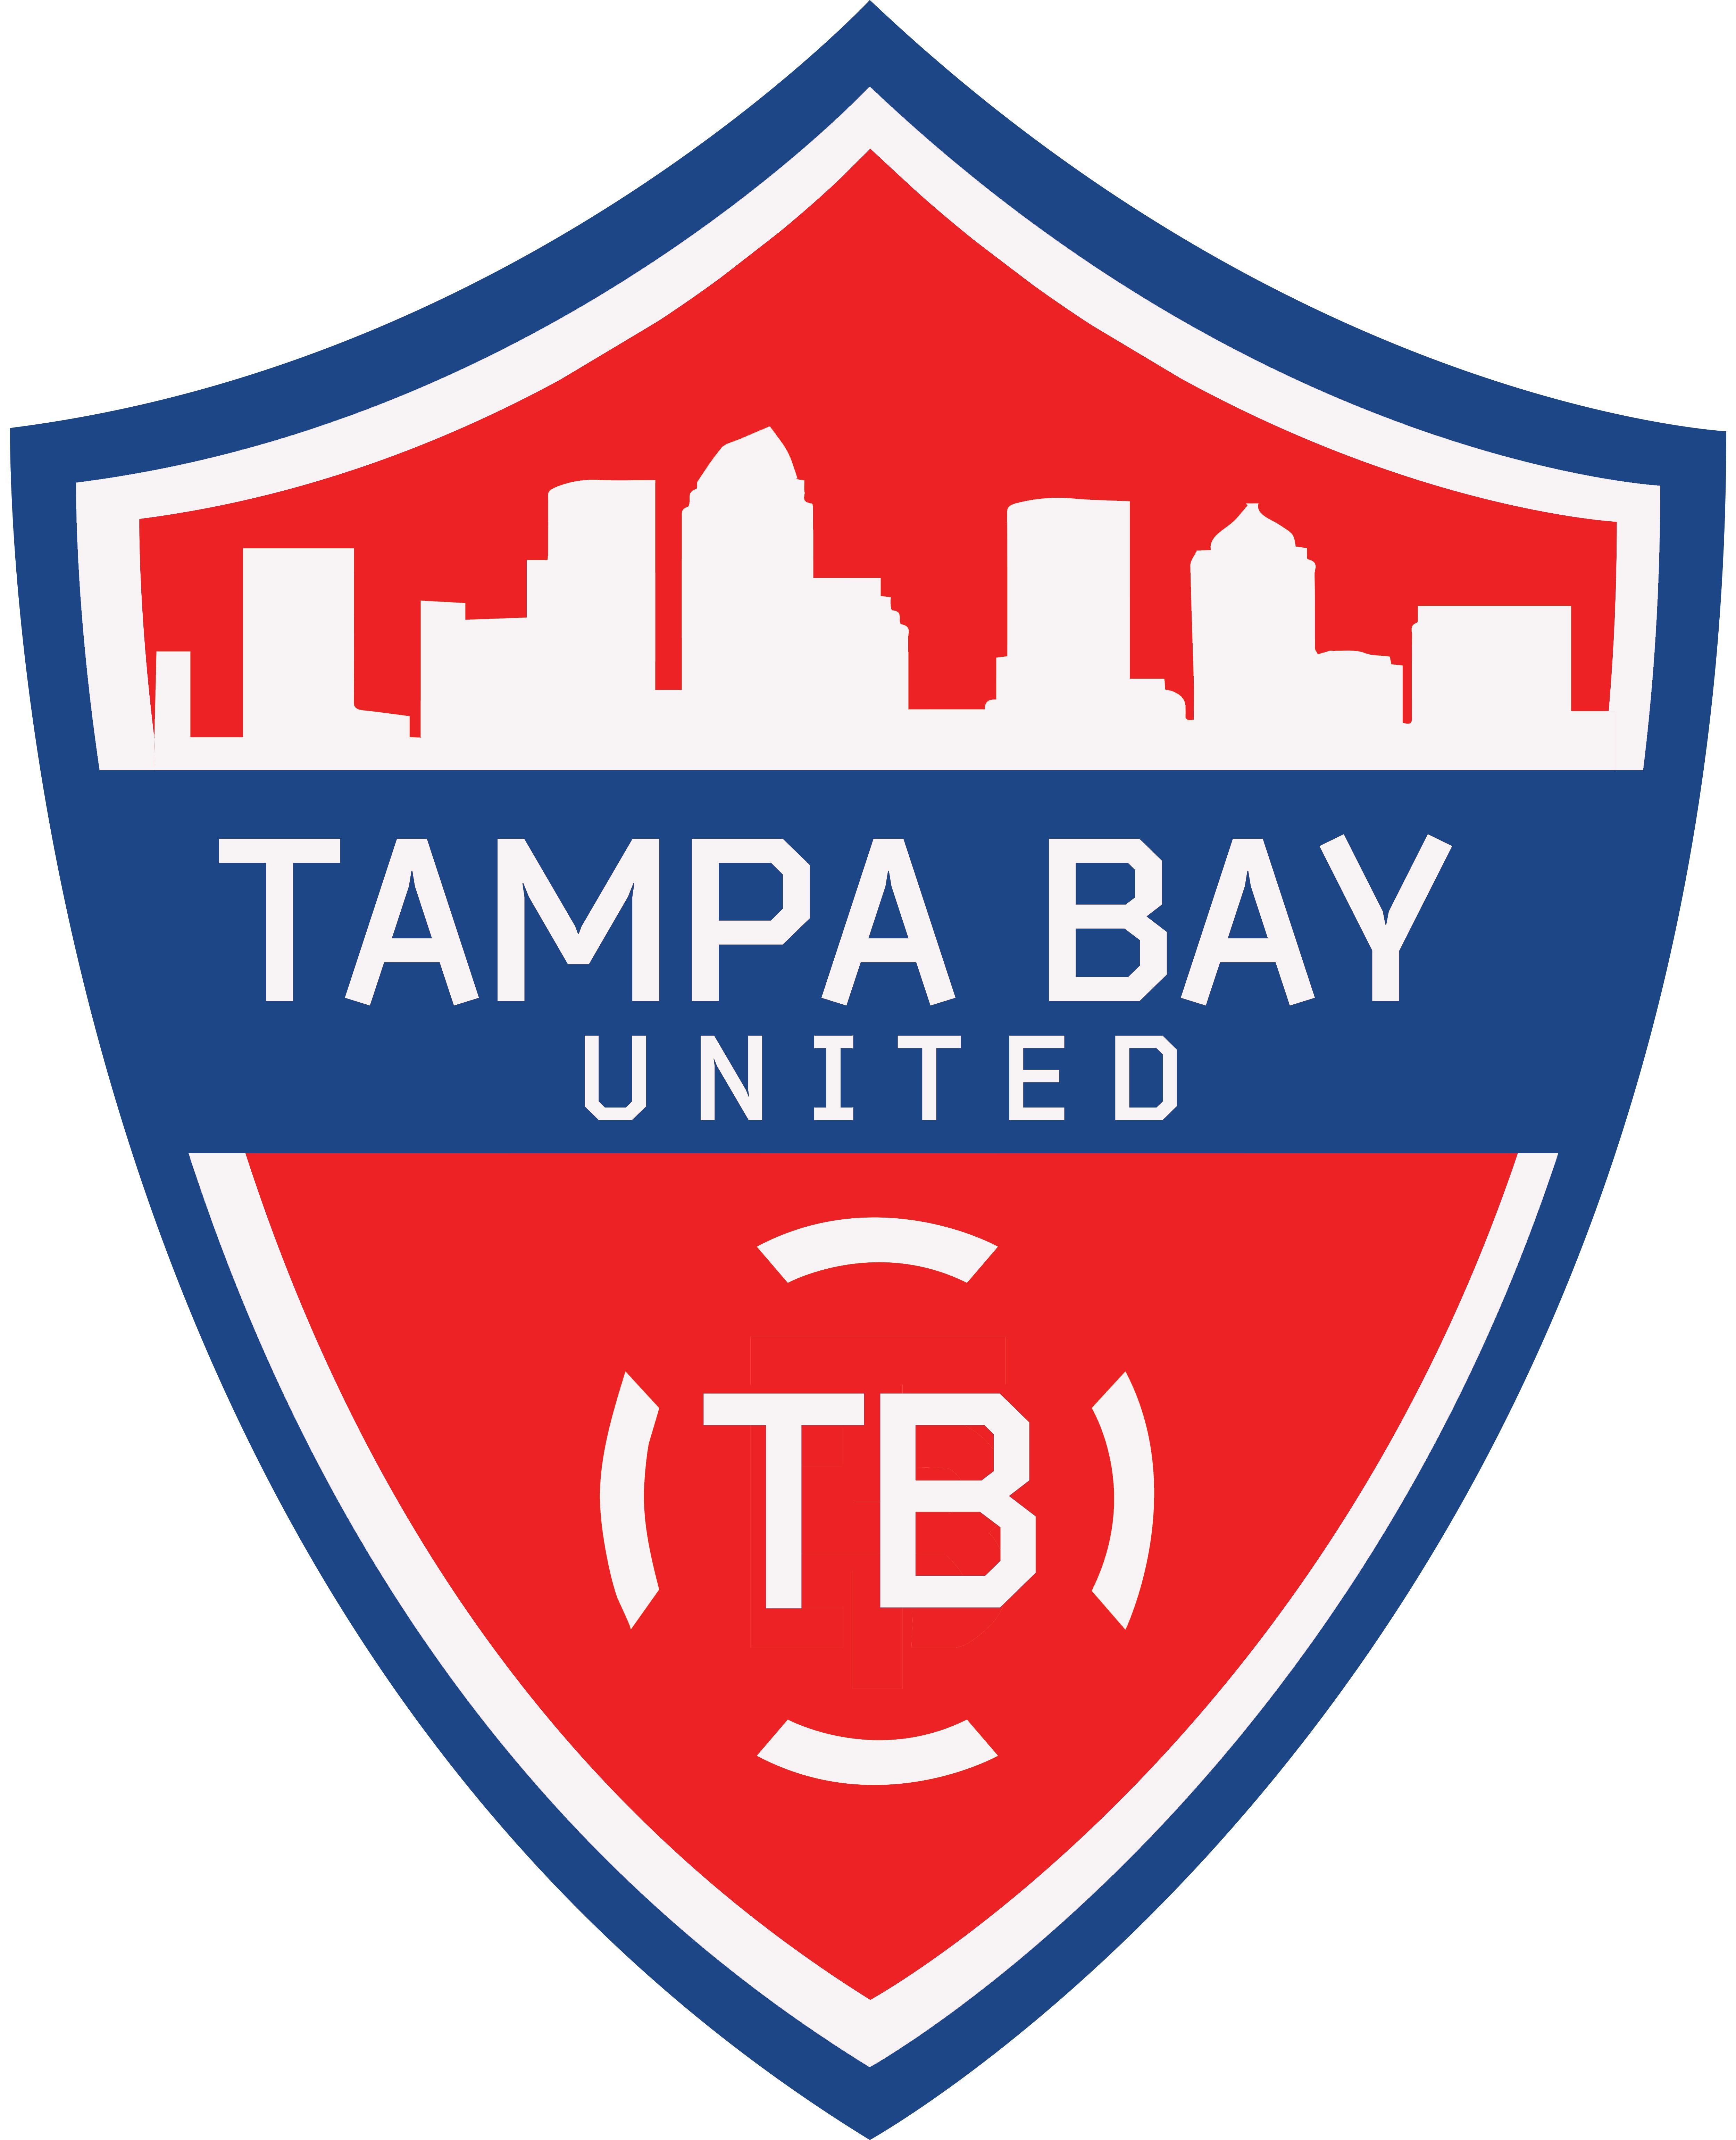 Tampa Bay United